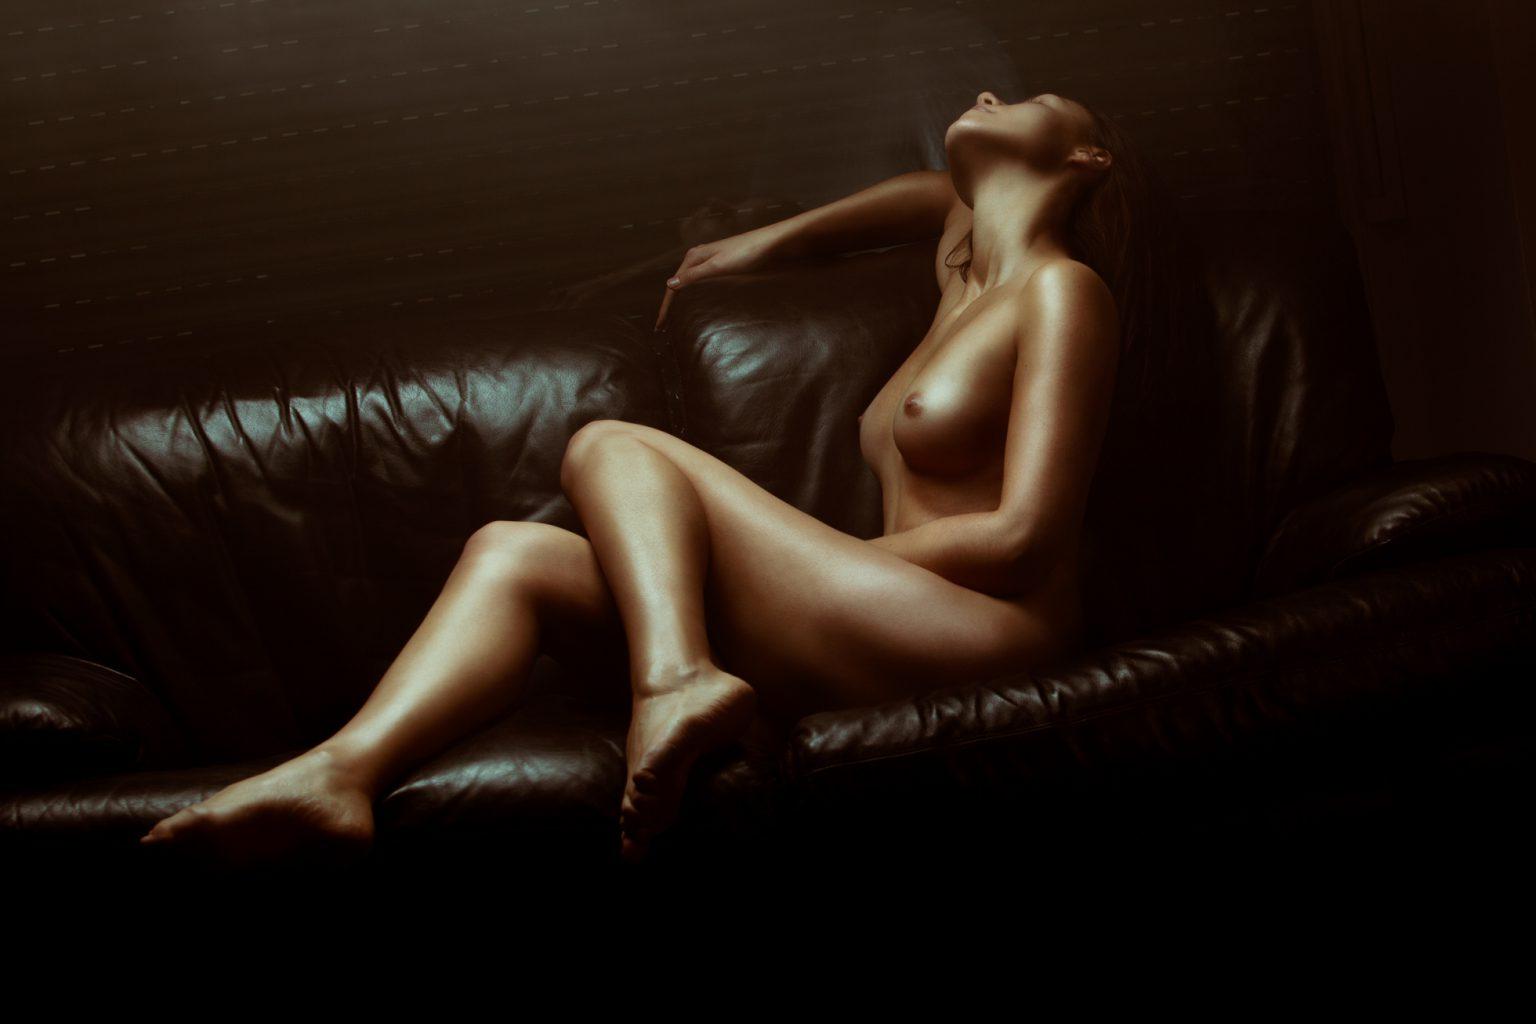 Art nackt erotik Curvy Erotic